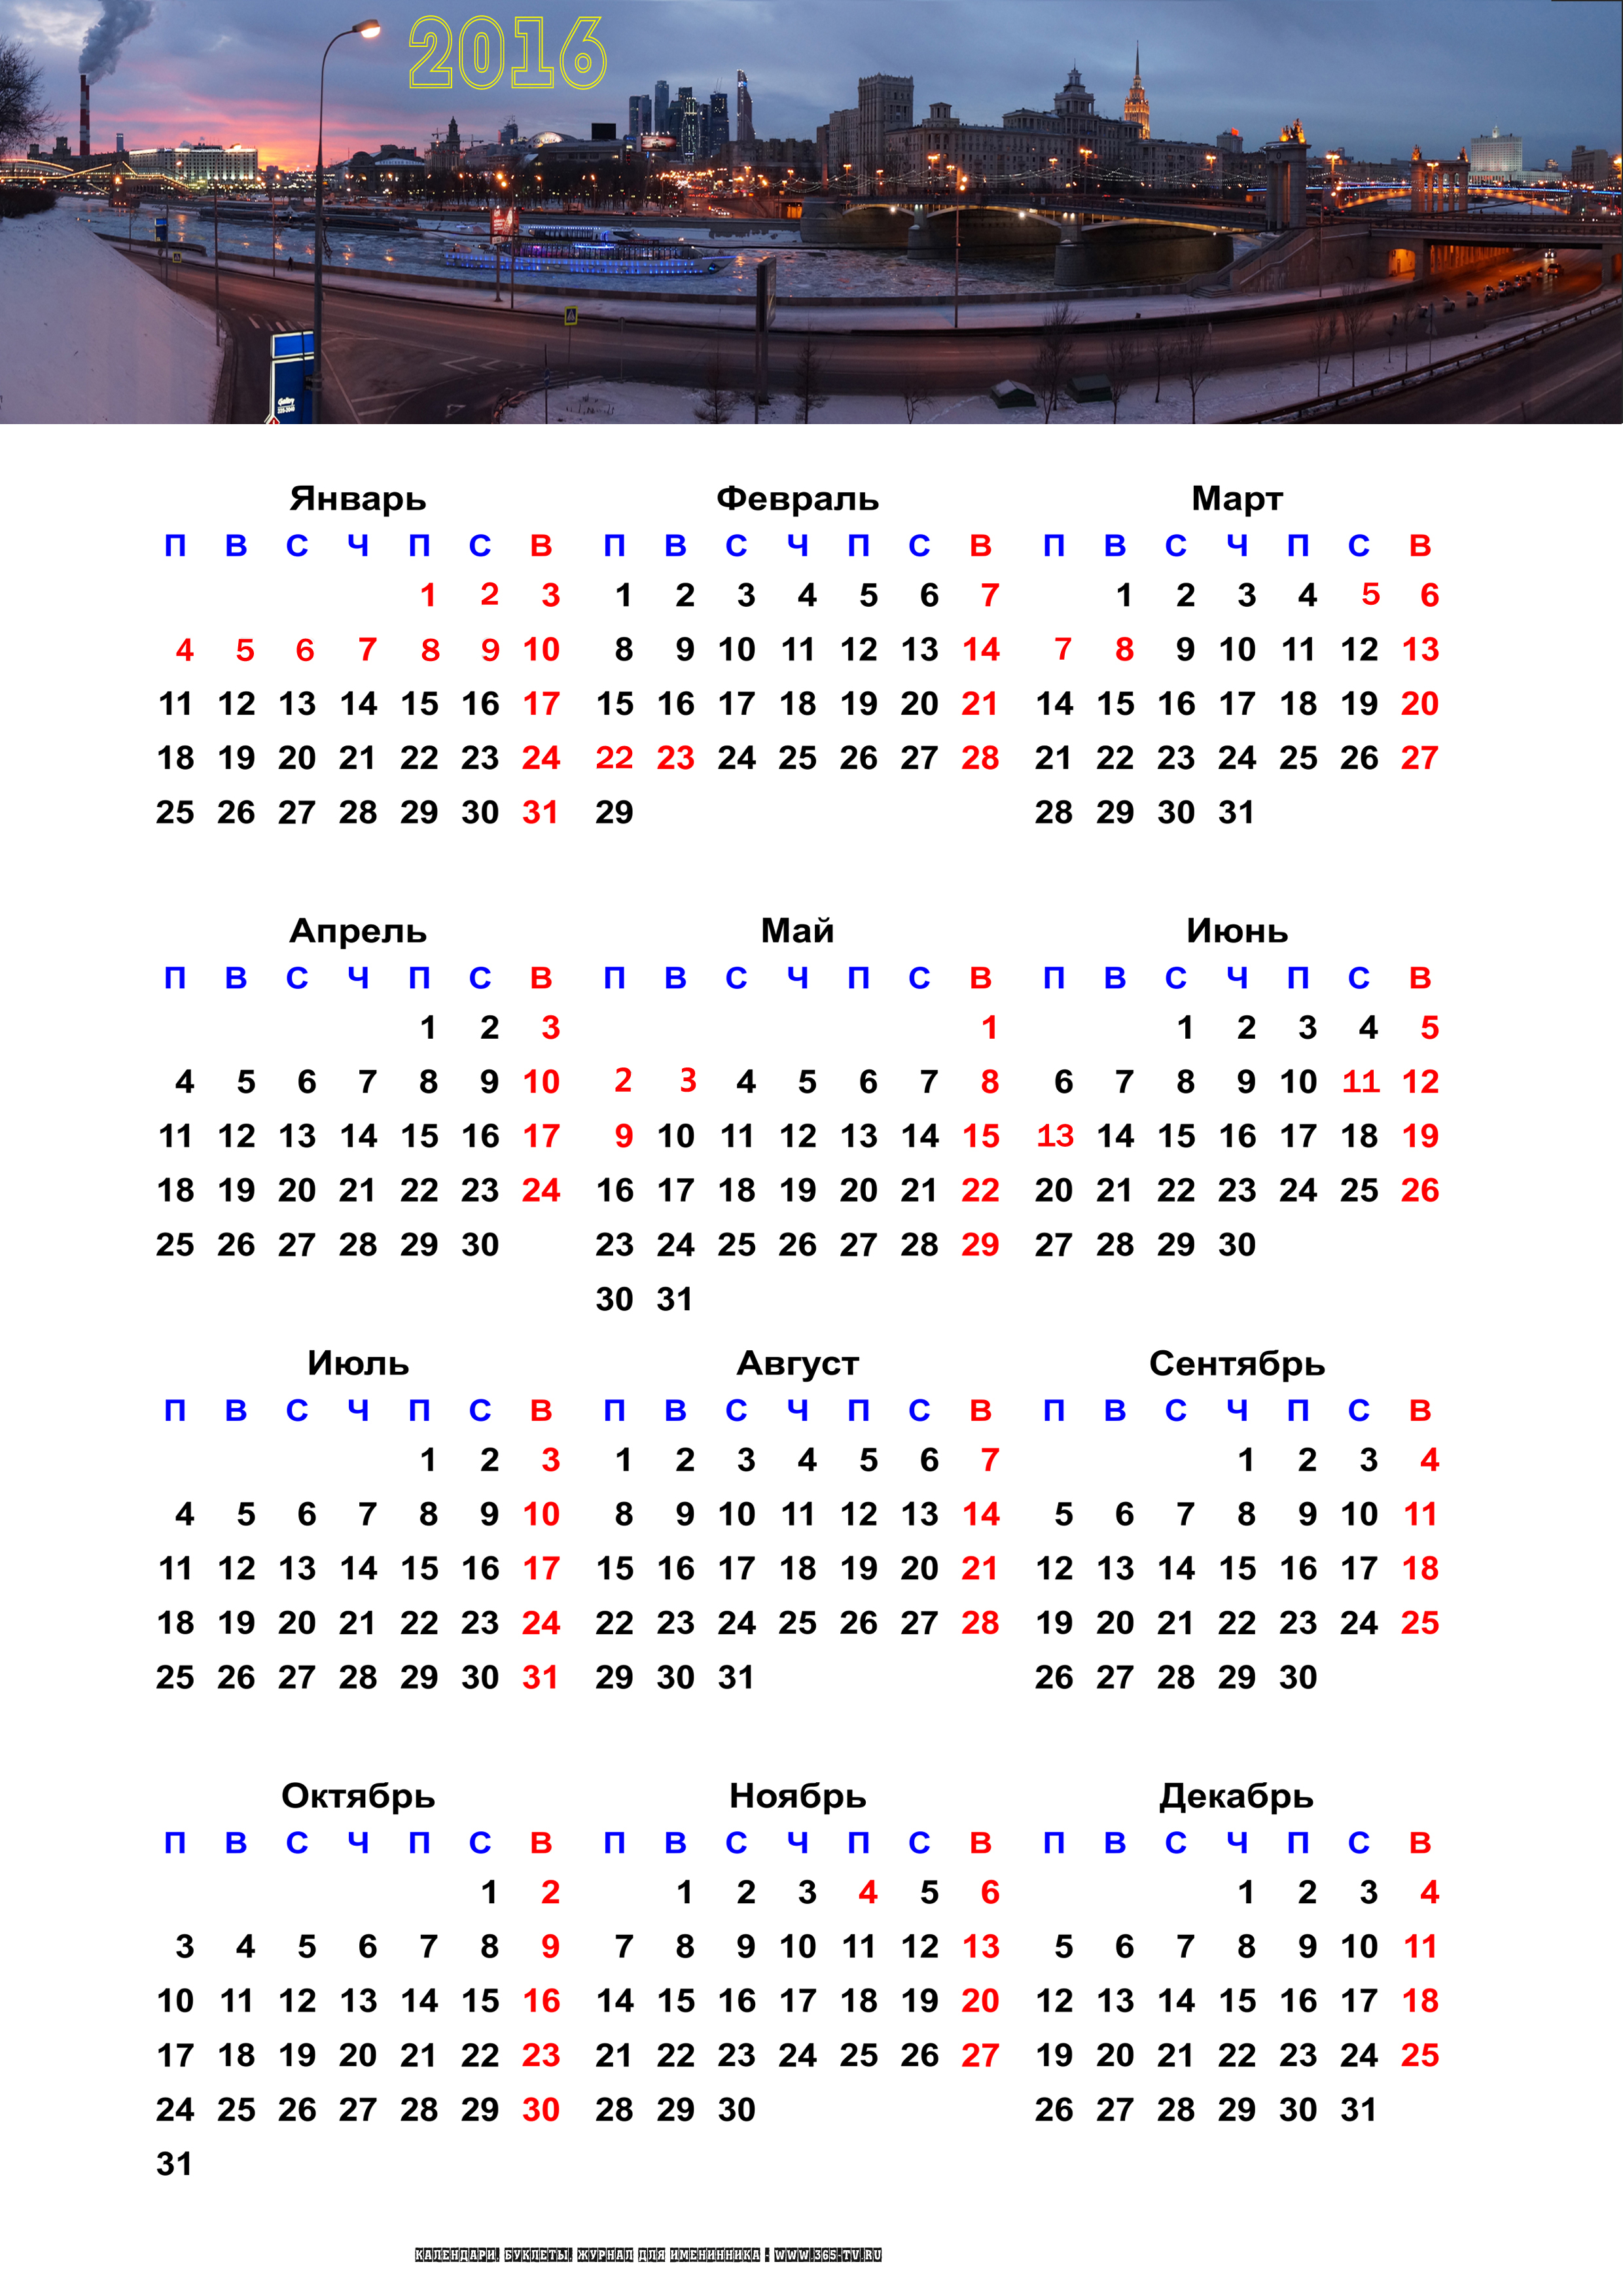 Лунный календарь 2017 огородника для беларуси по знакам зодиака